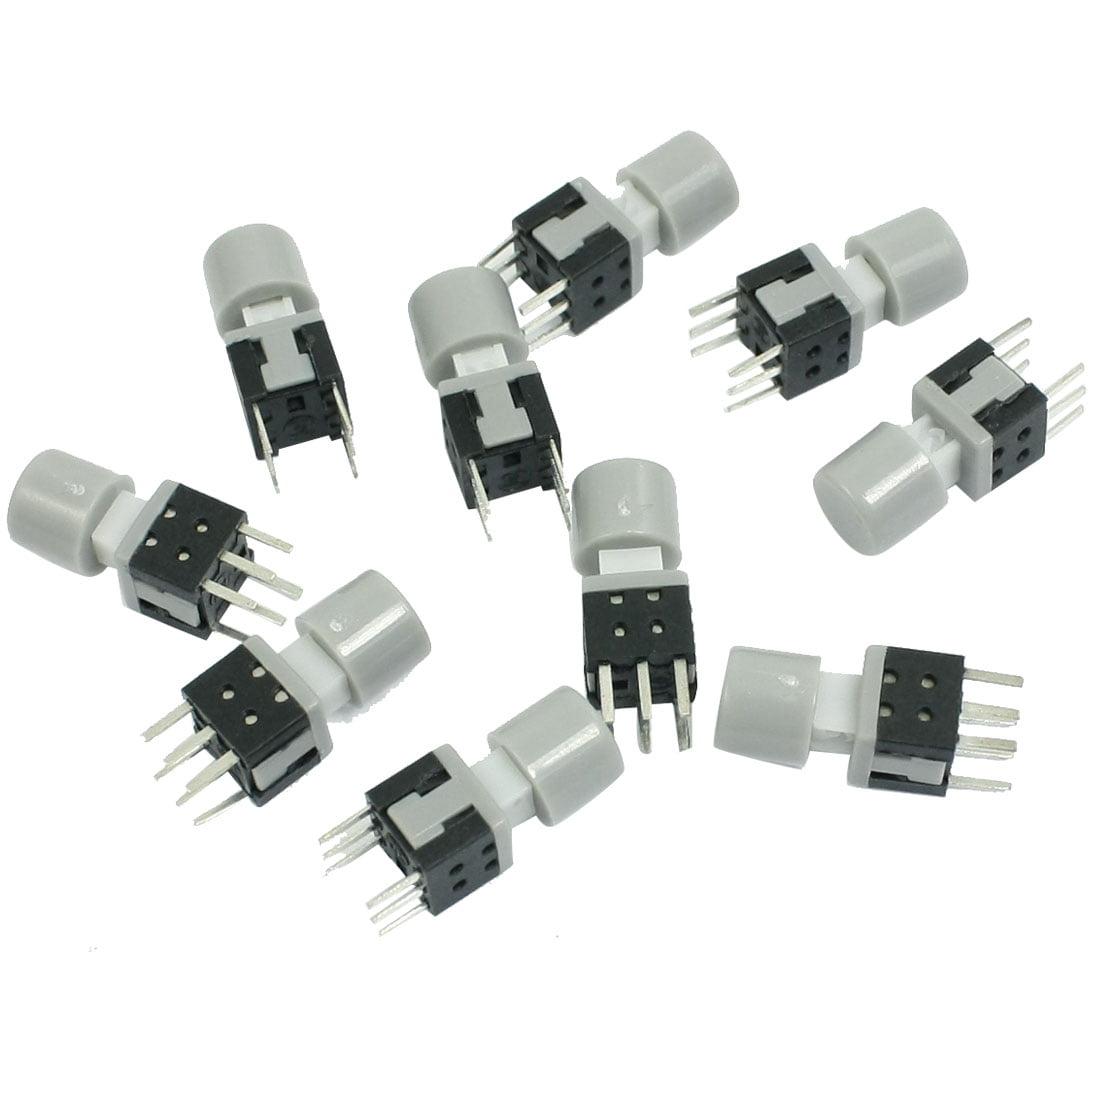 Thermal Dynamic 9-8237 Shield Cup SL60//100 Plasma Torch Mfg After Market 1PK